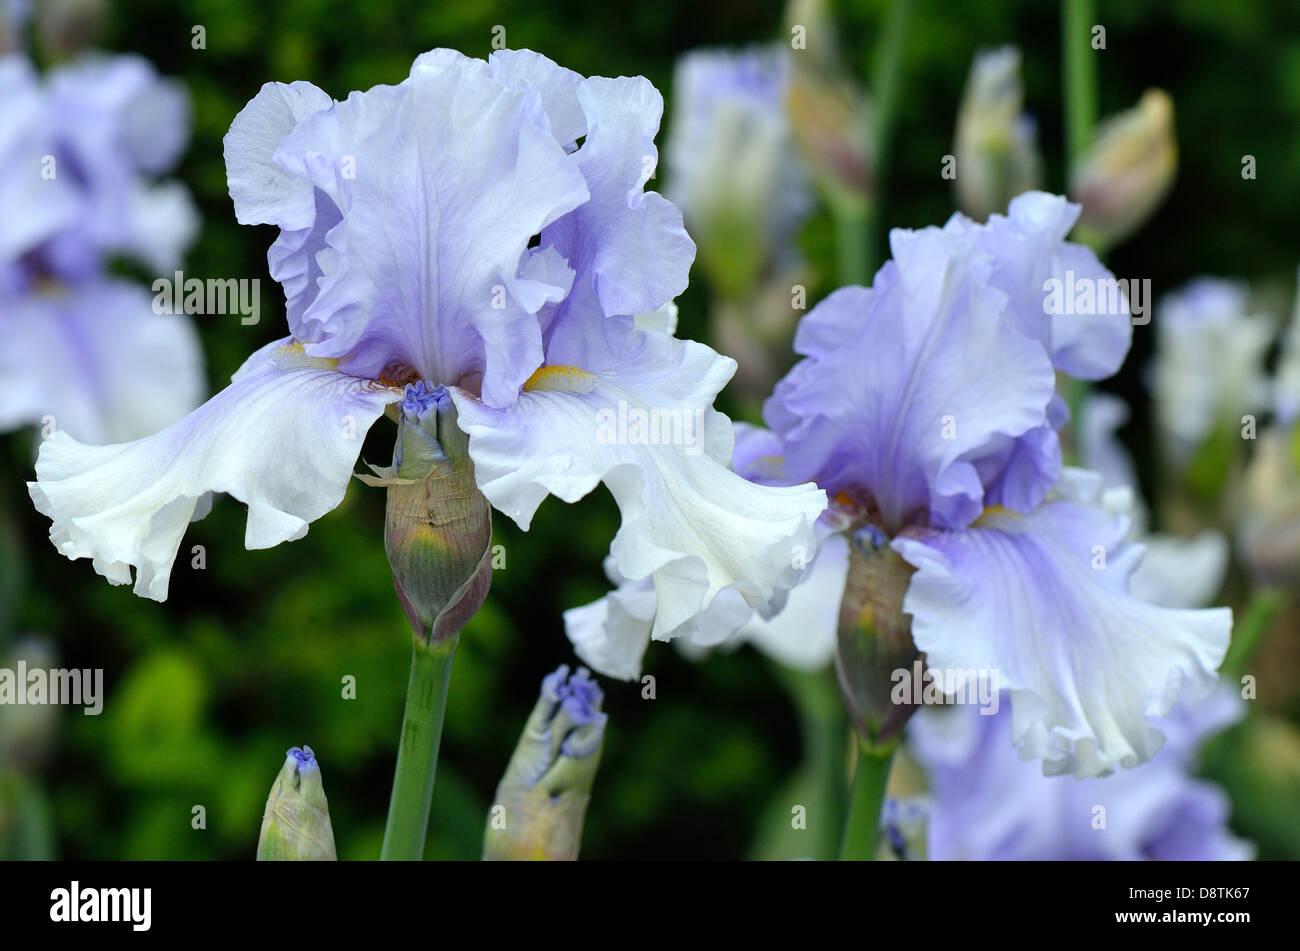 Iris flowers halifax image collections flower wallpaper hd iris flowers halifax choice image flower wallpaper hd iris flowers halifax gallery flower wallpaper hd iris izmirmasajfo